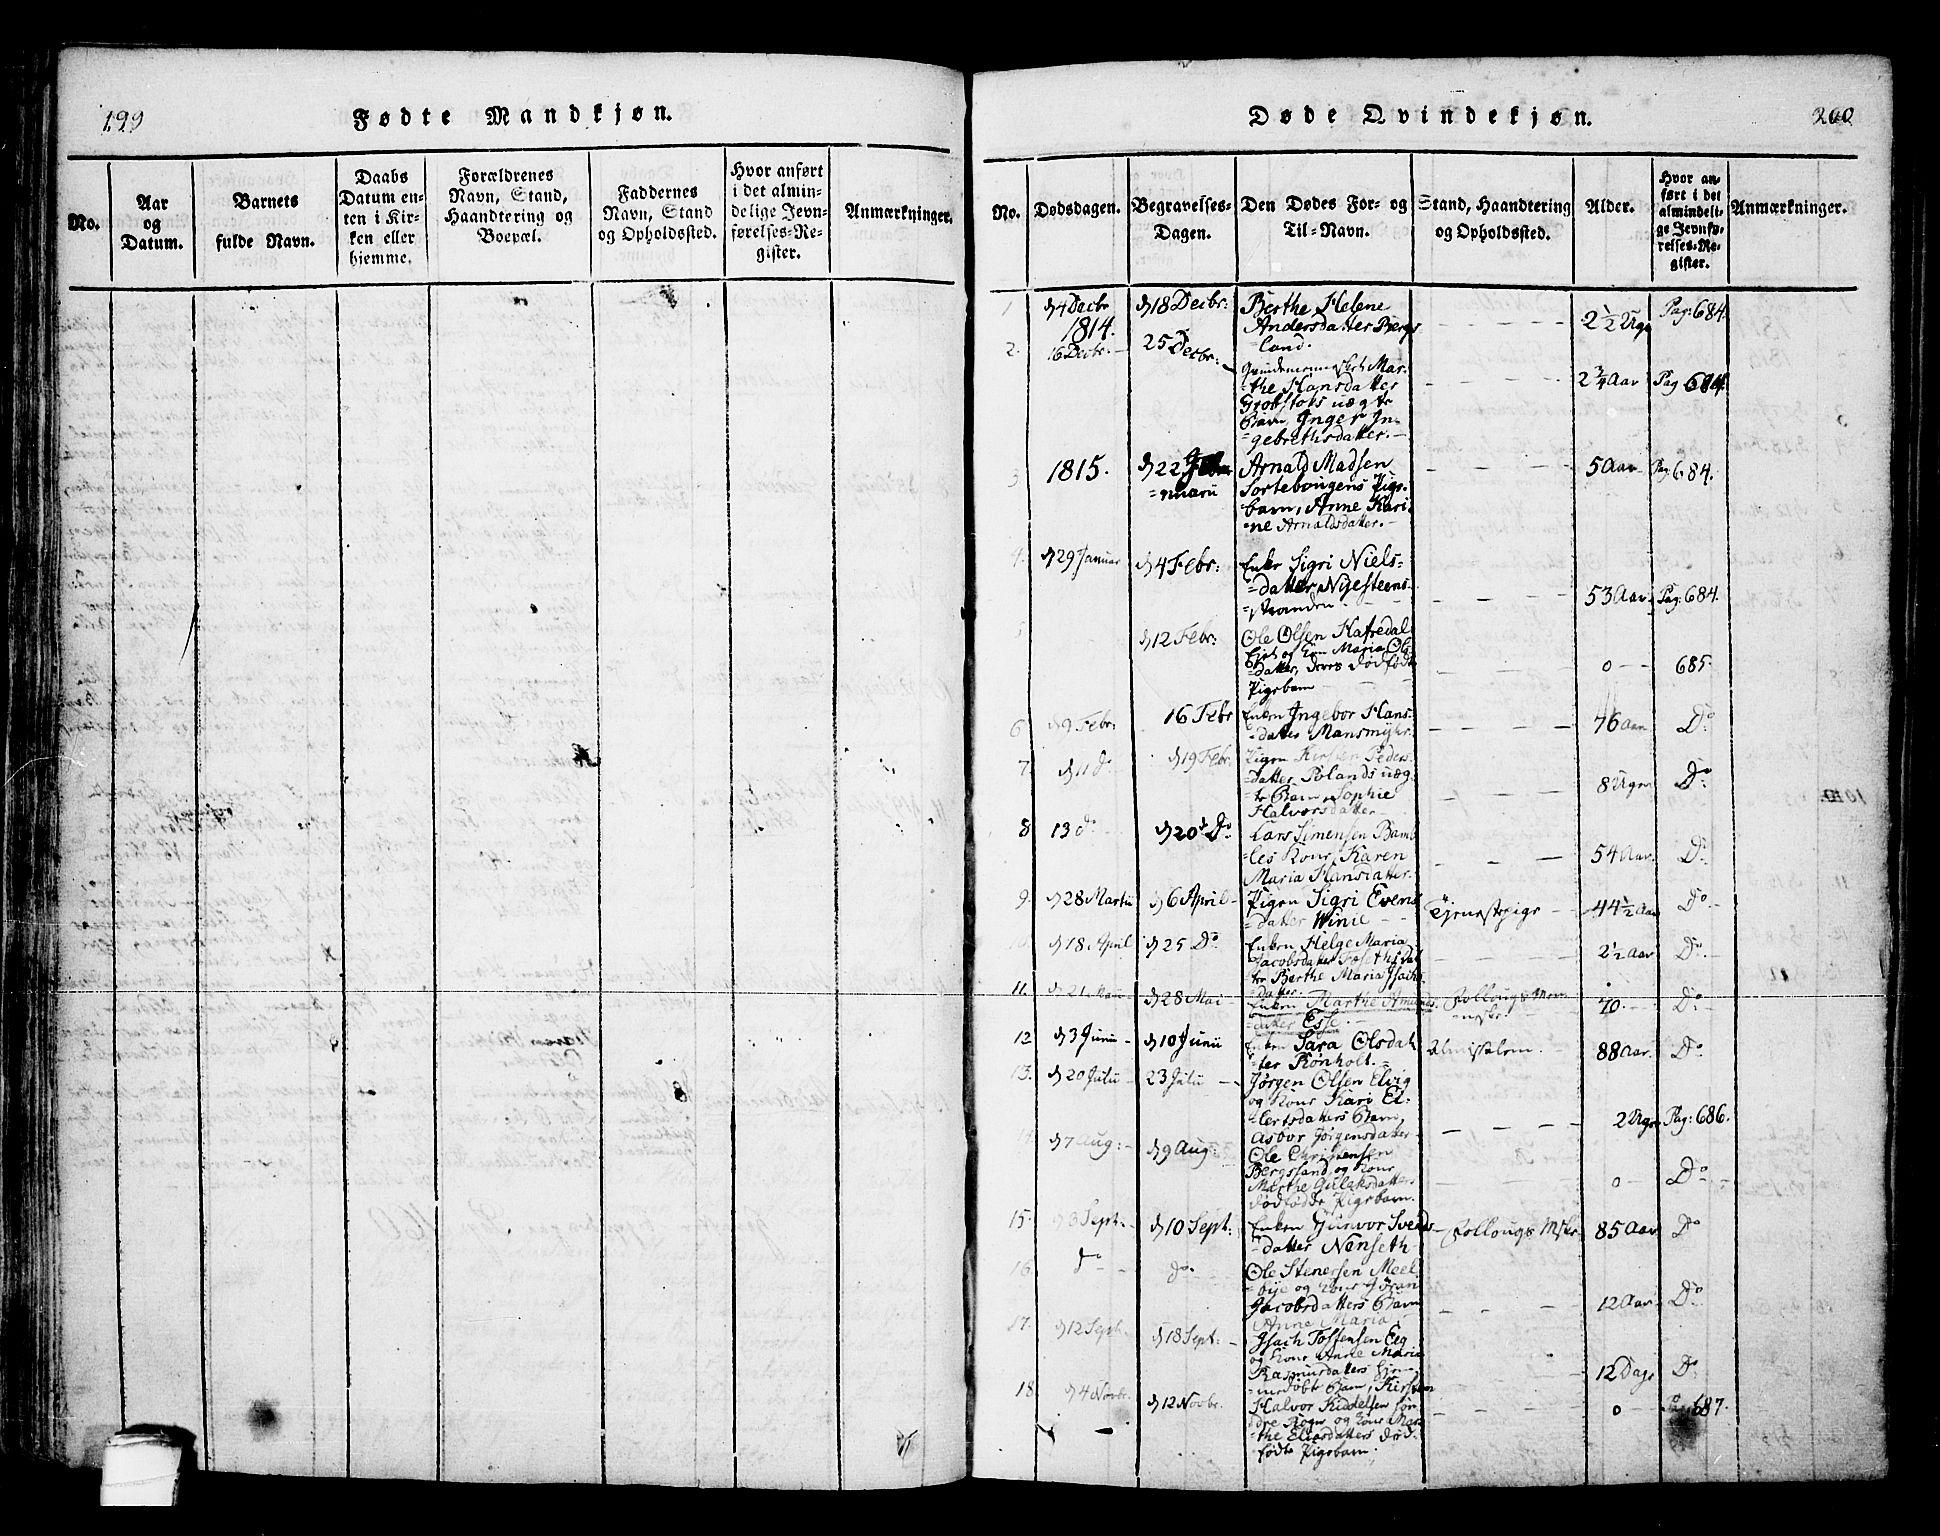 SAKO, Bamble kirkebøker, F/Fa/L0003: Ministerialbok nr. I 3 /1, 1814-1834, s. 199-200